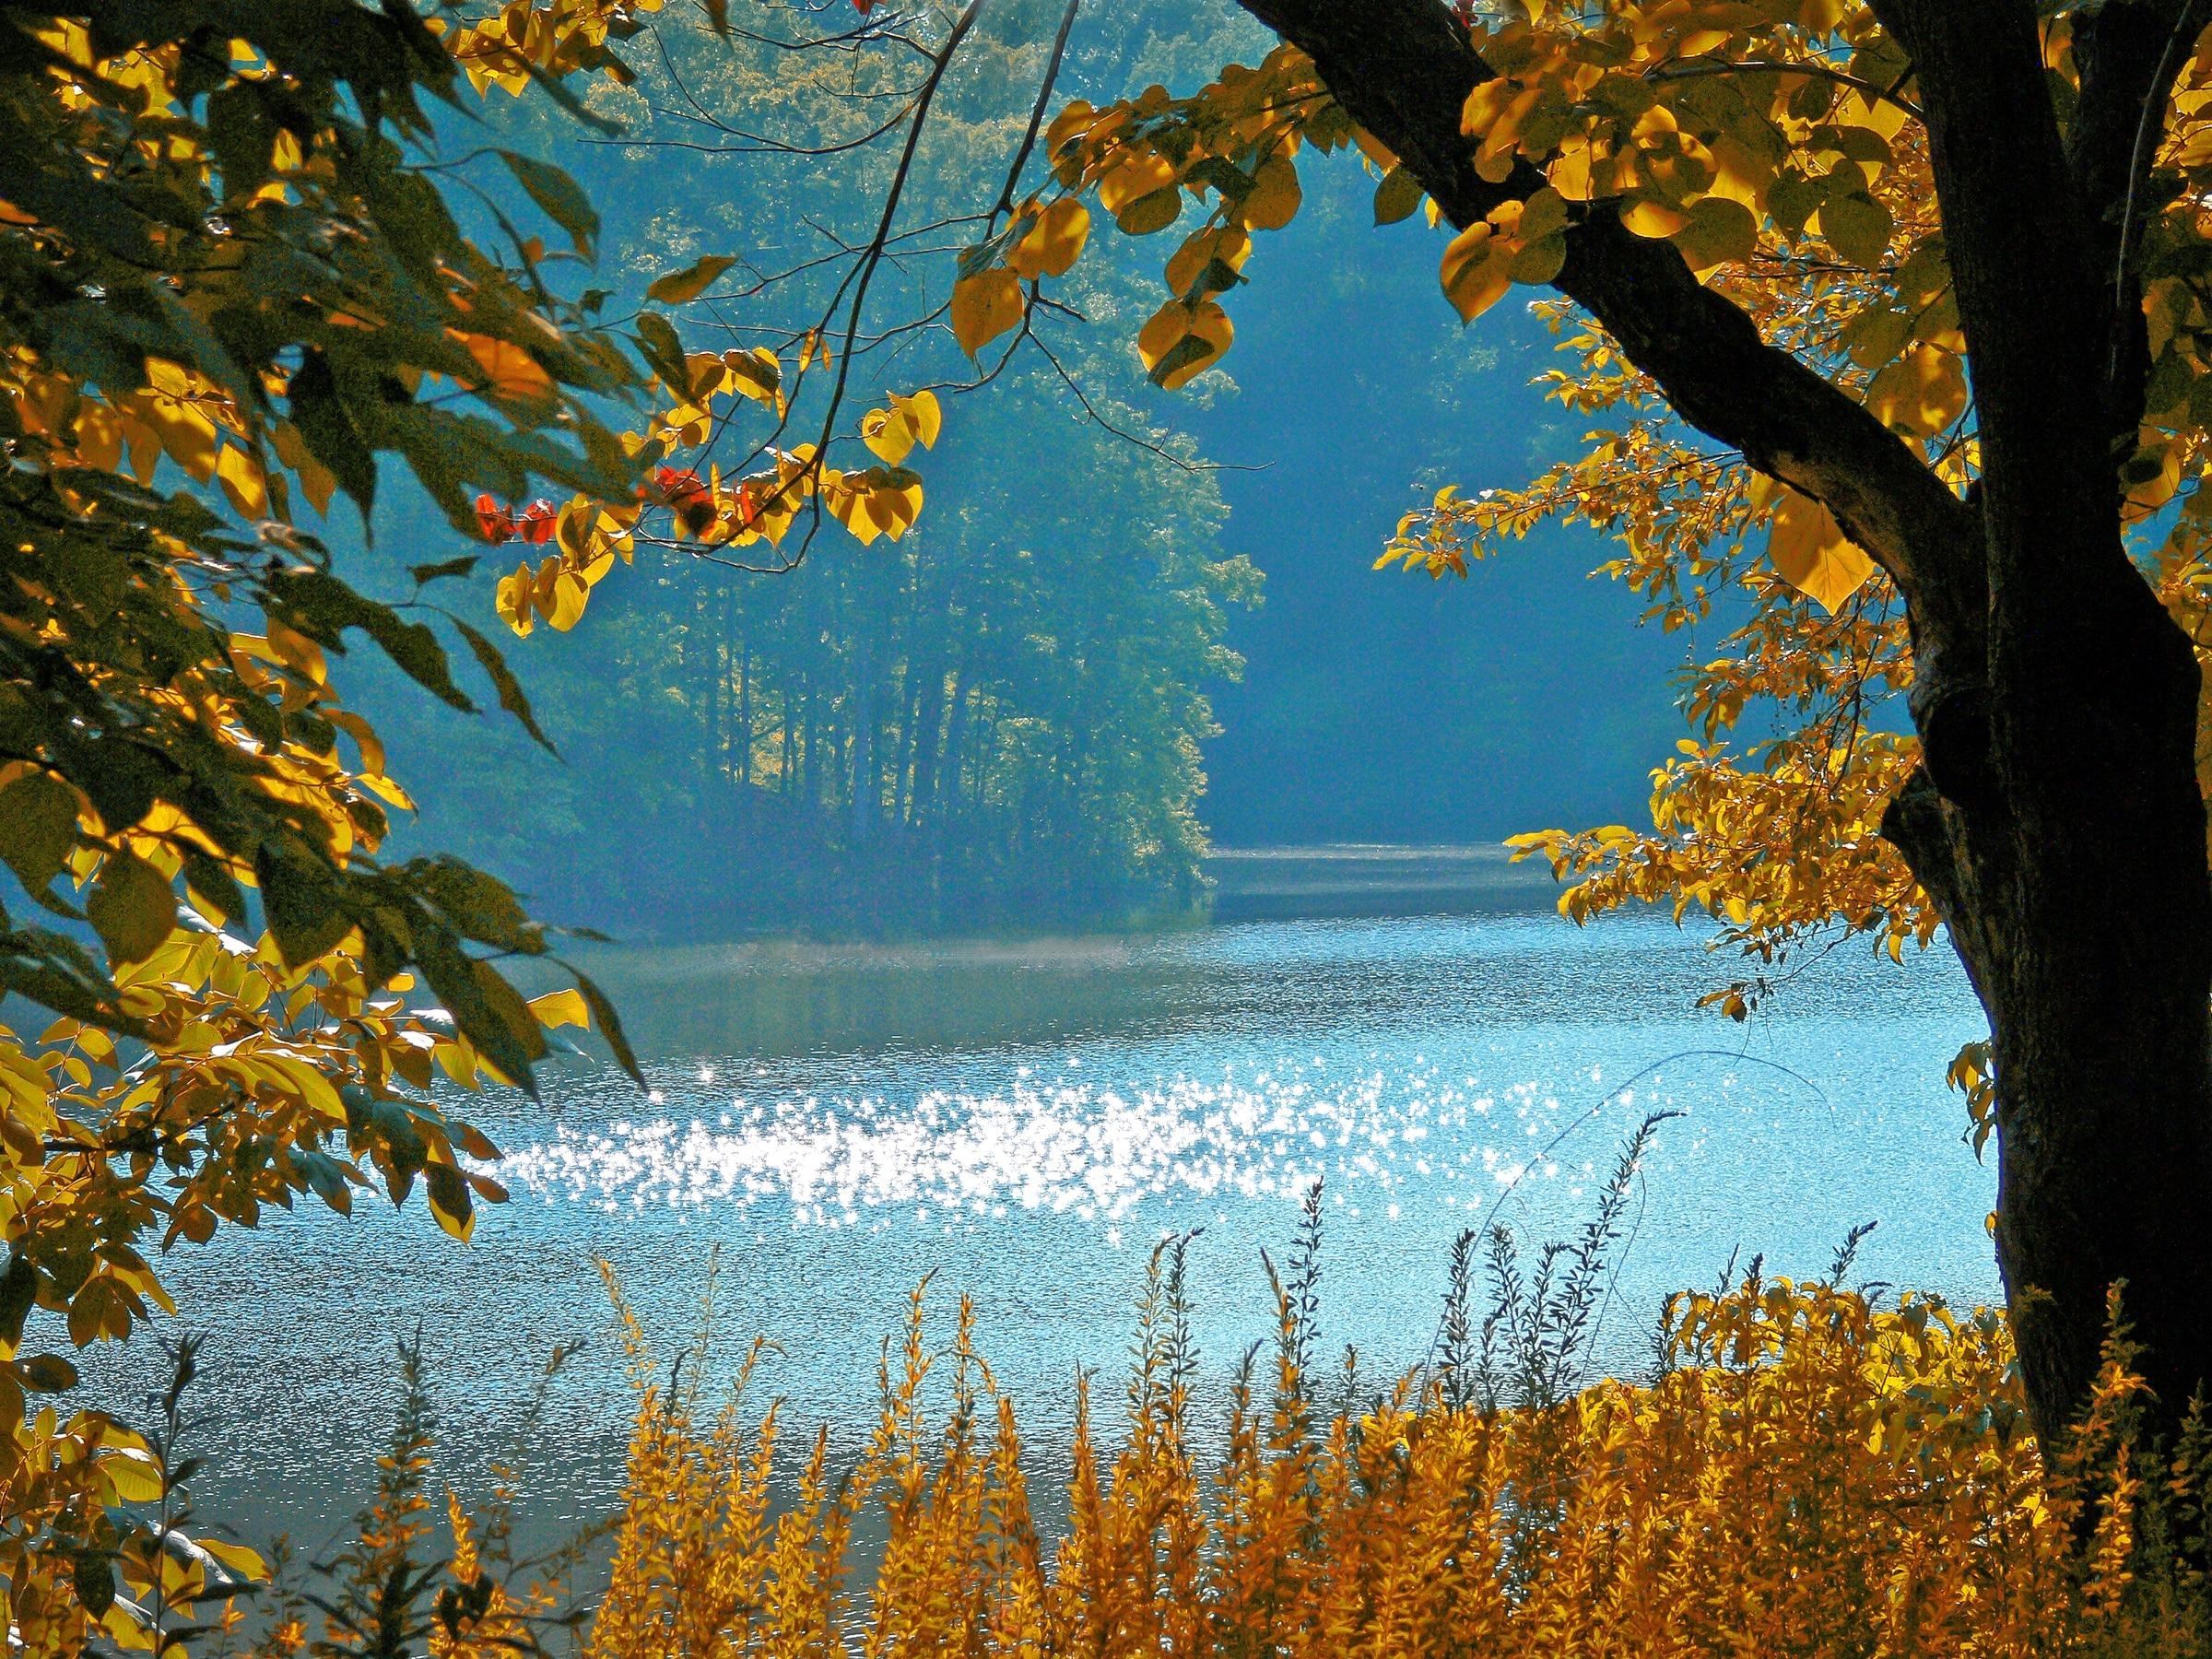 Lake Norman, Mooresville, North Carolina, United States of America